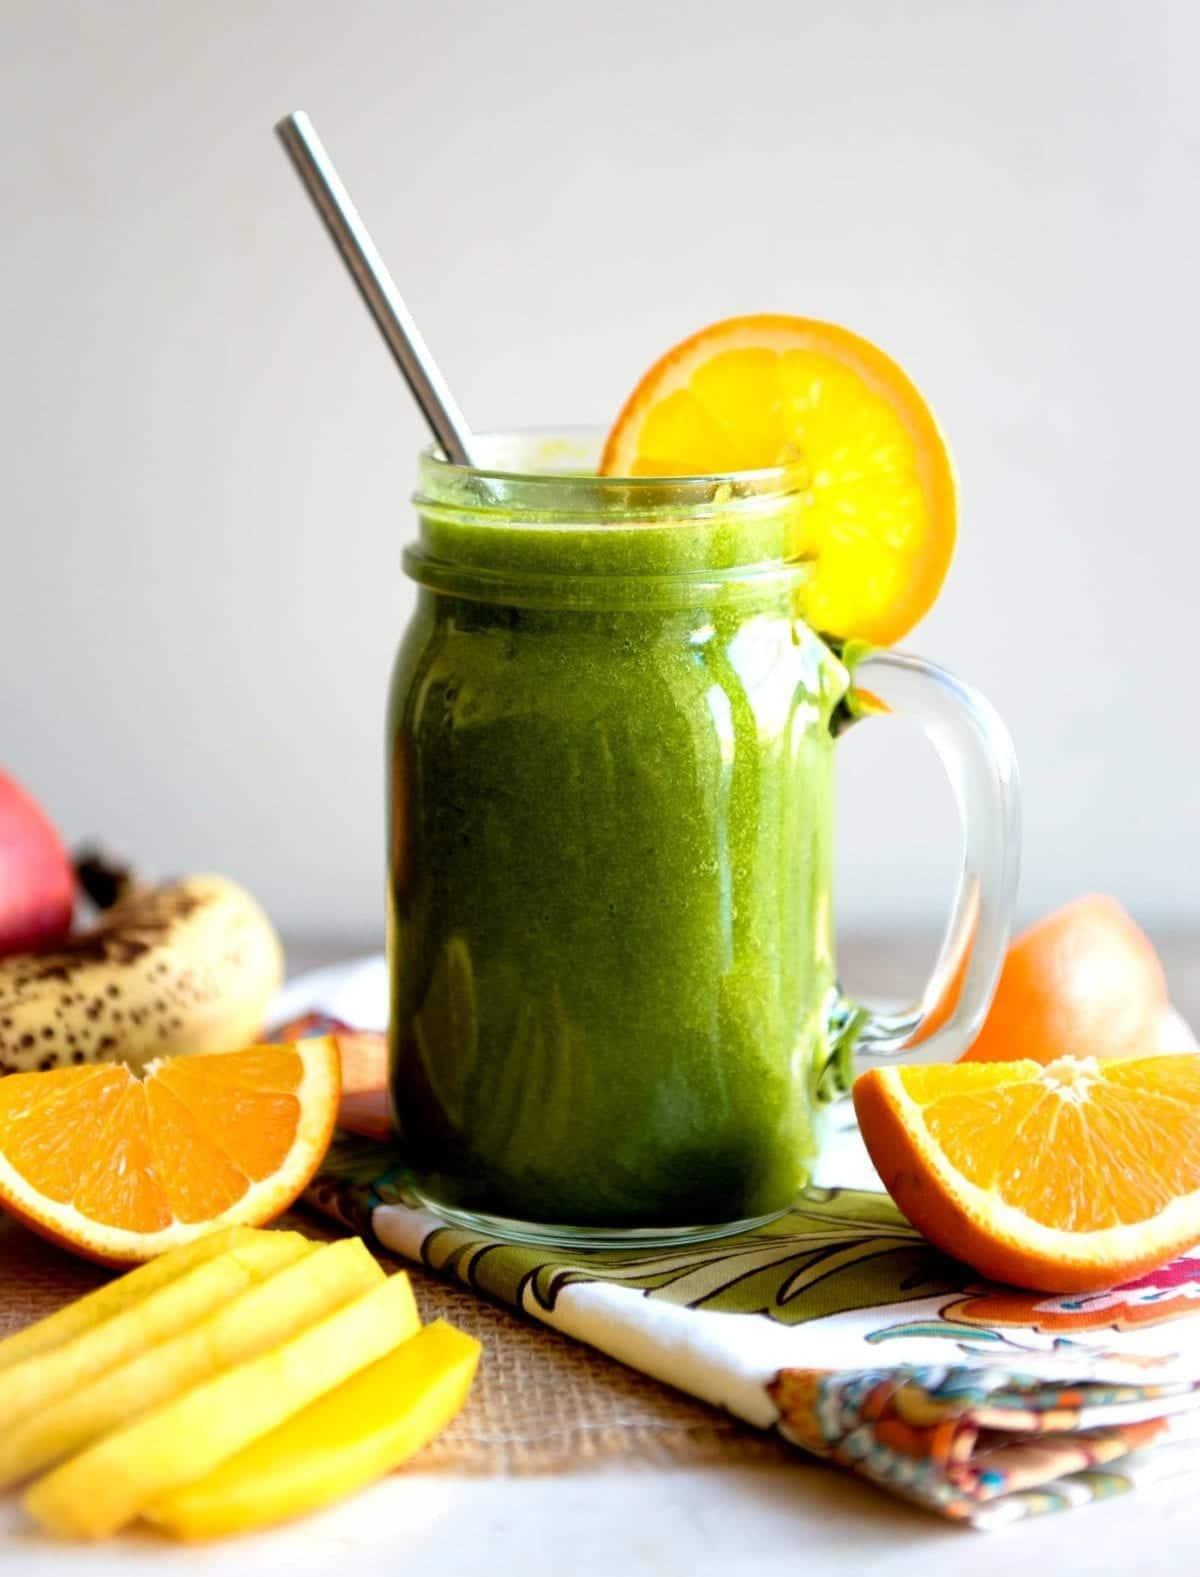 Green smoothie recipe with mango